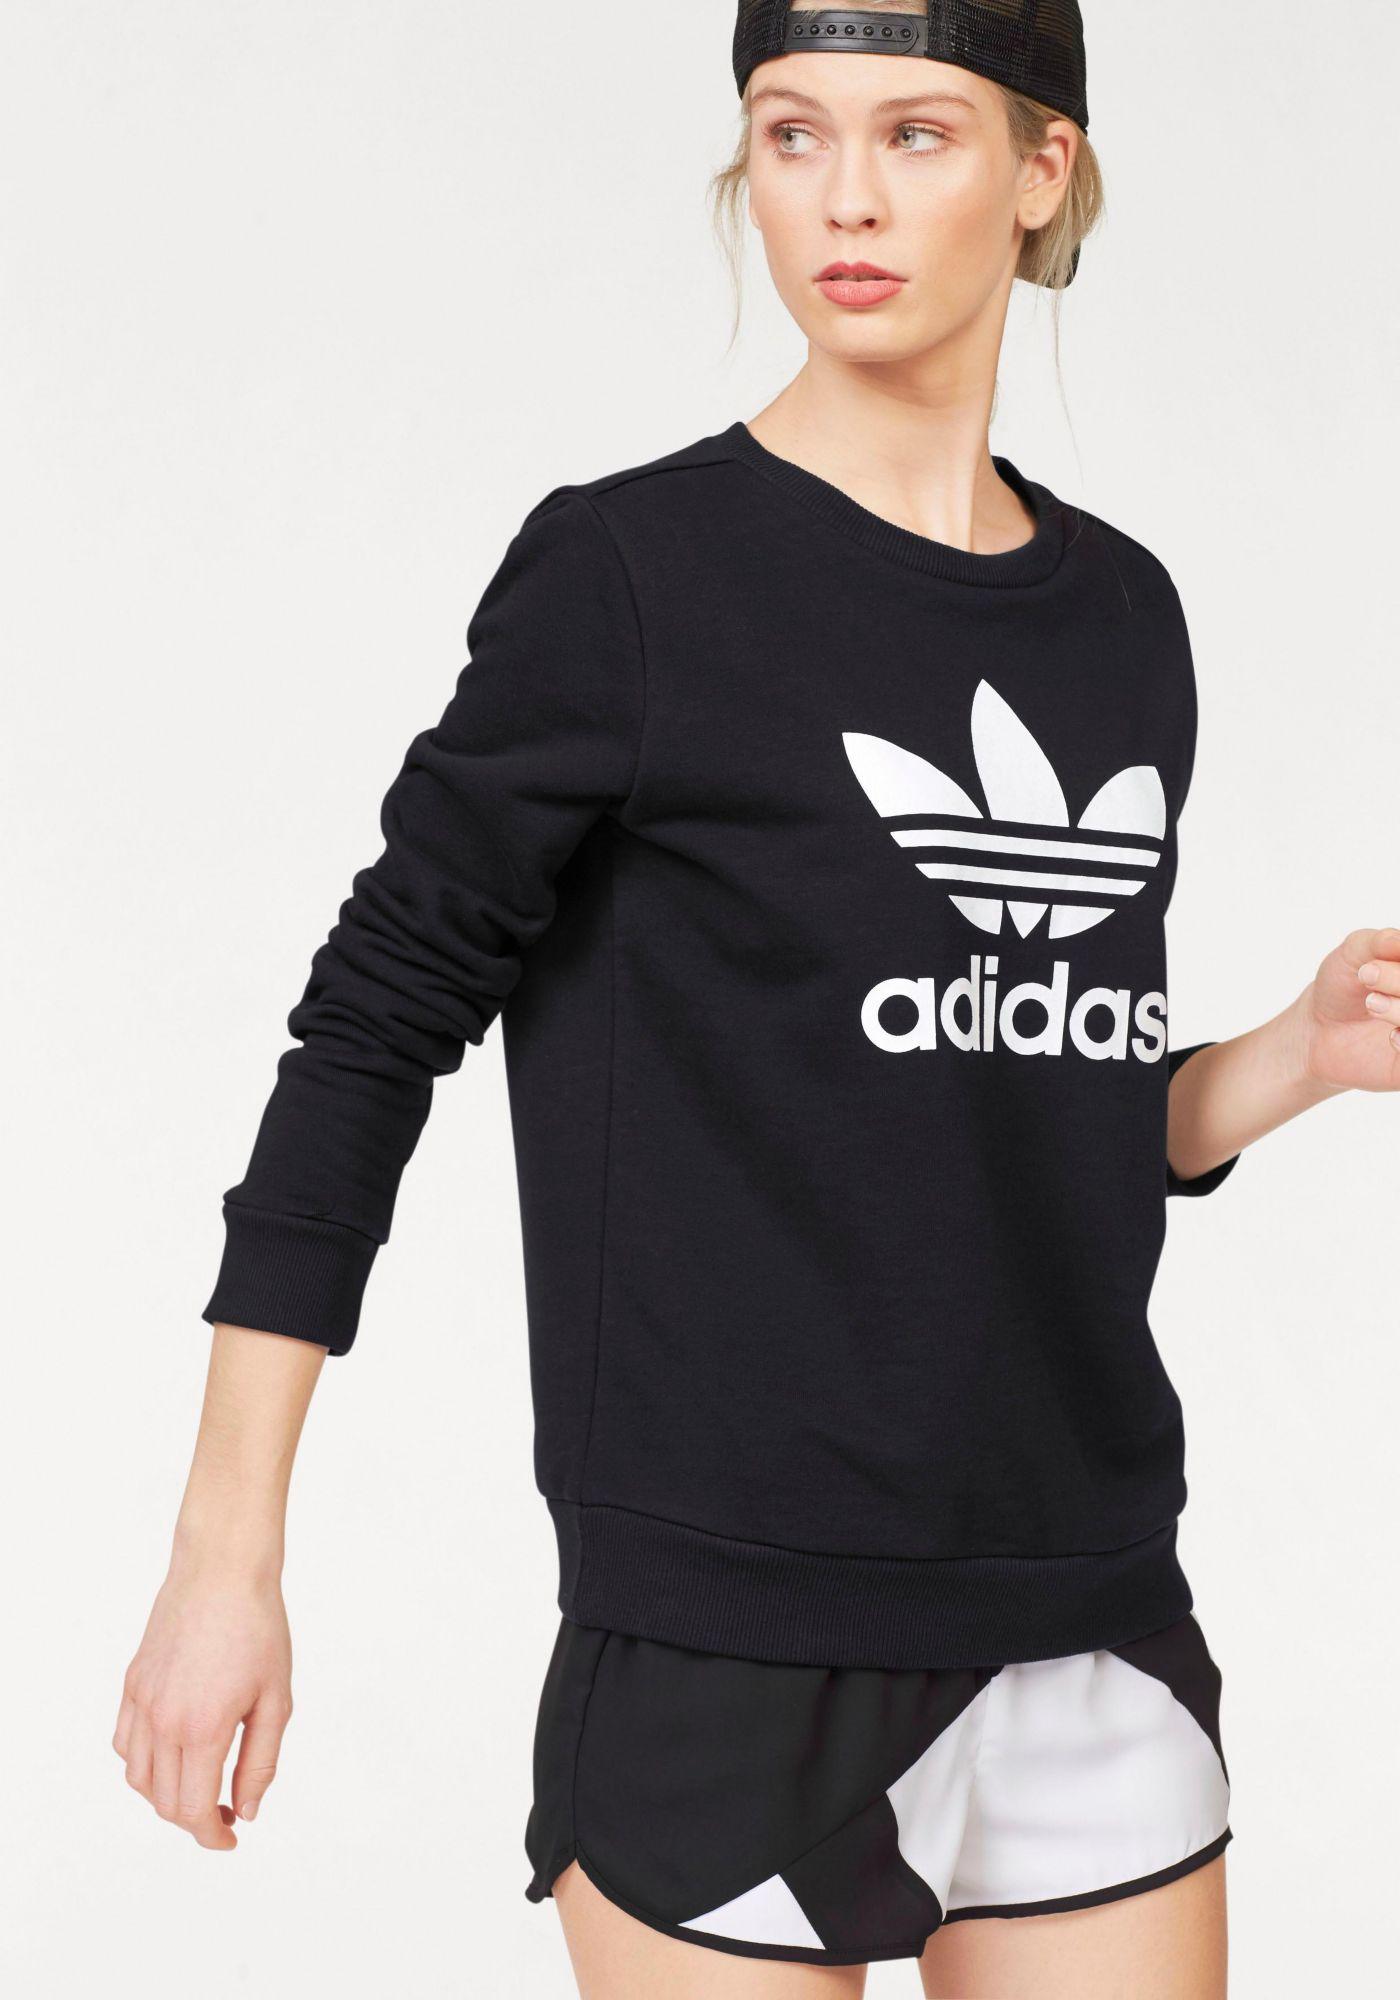 ADIDAS ORIGINALS adidas Originals Sweatshirt »CREW SWEATER«